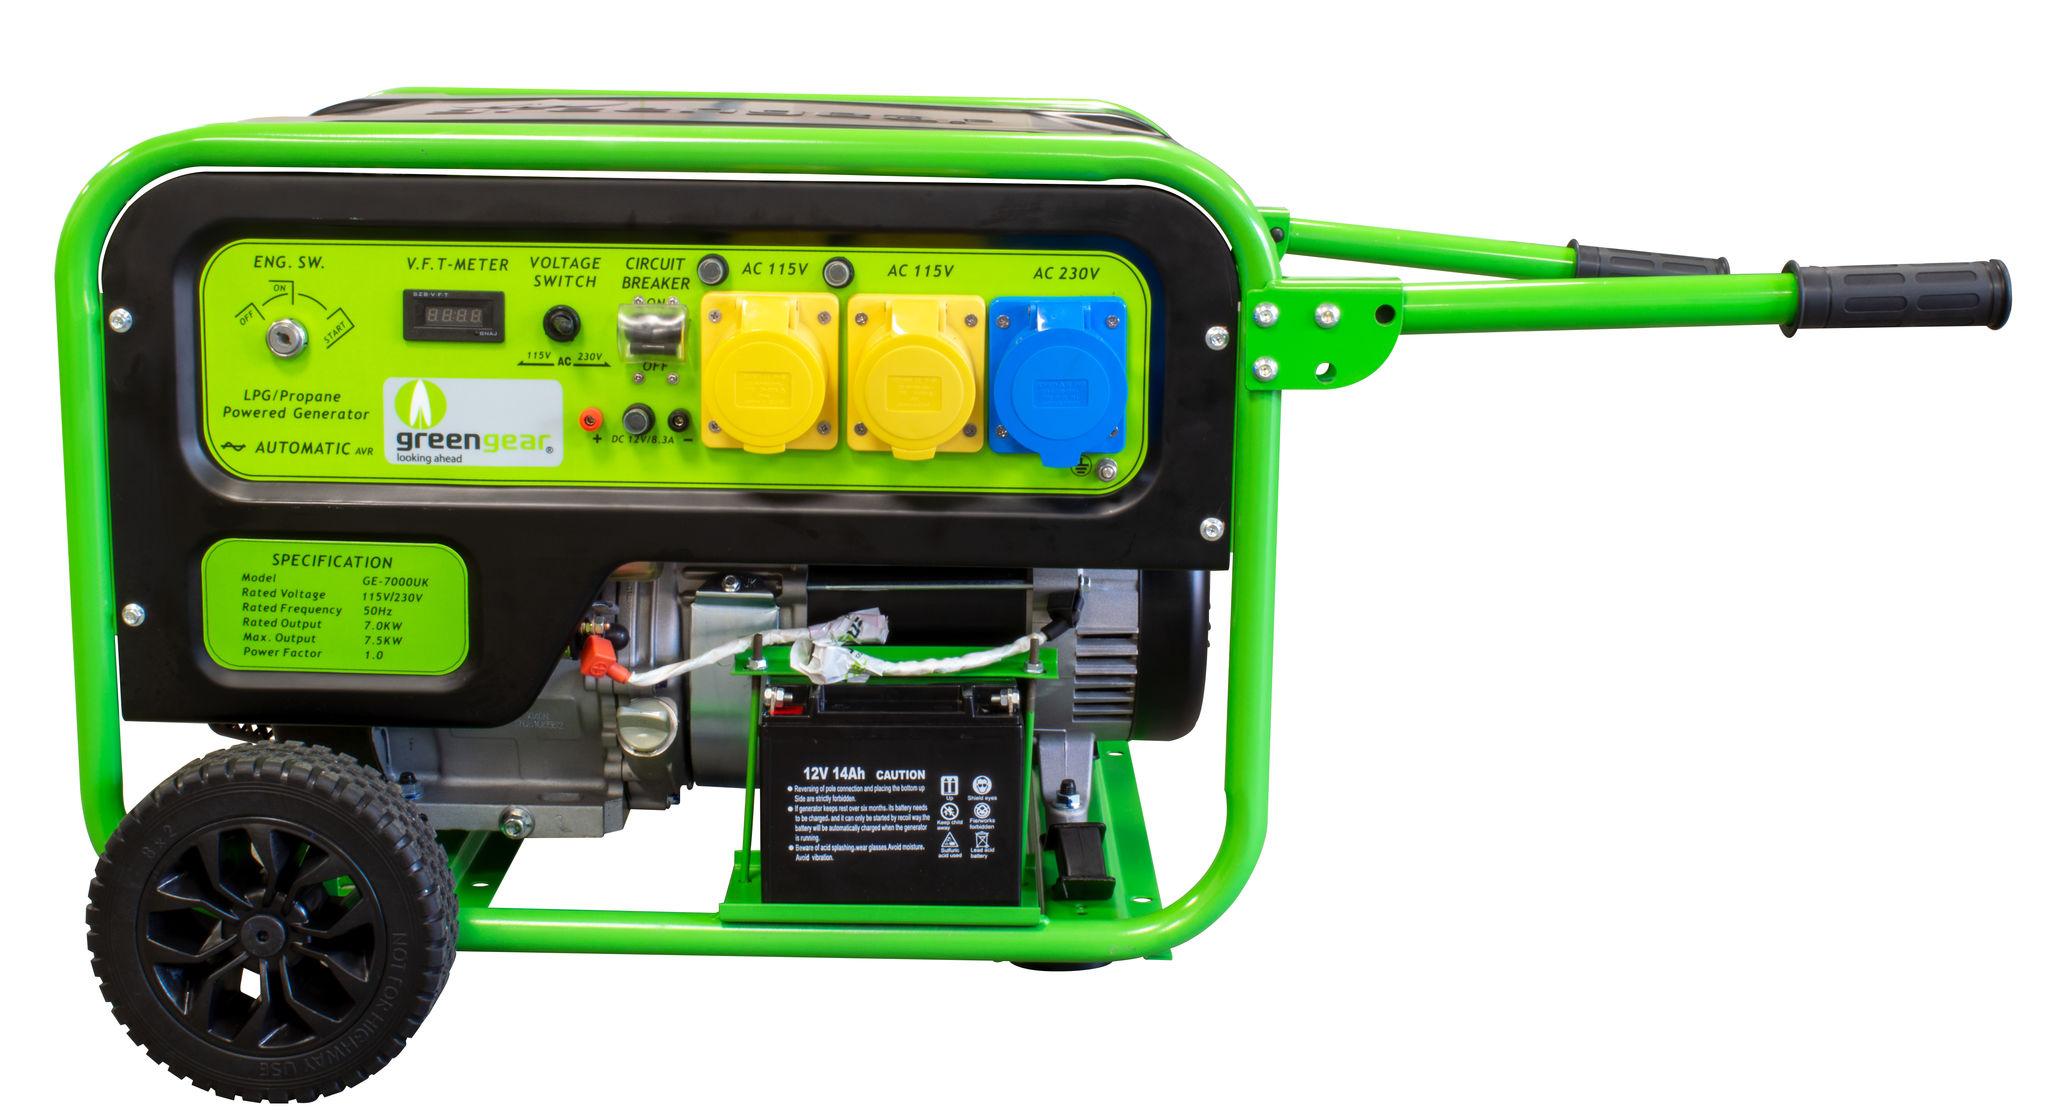 7kW Generator image 1